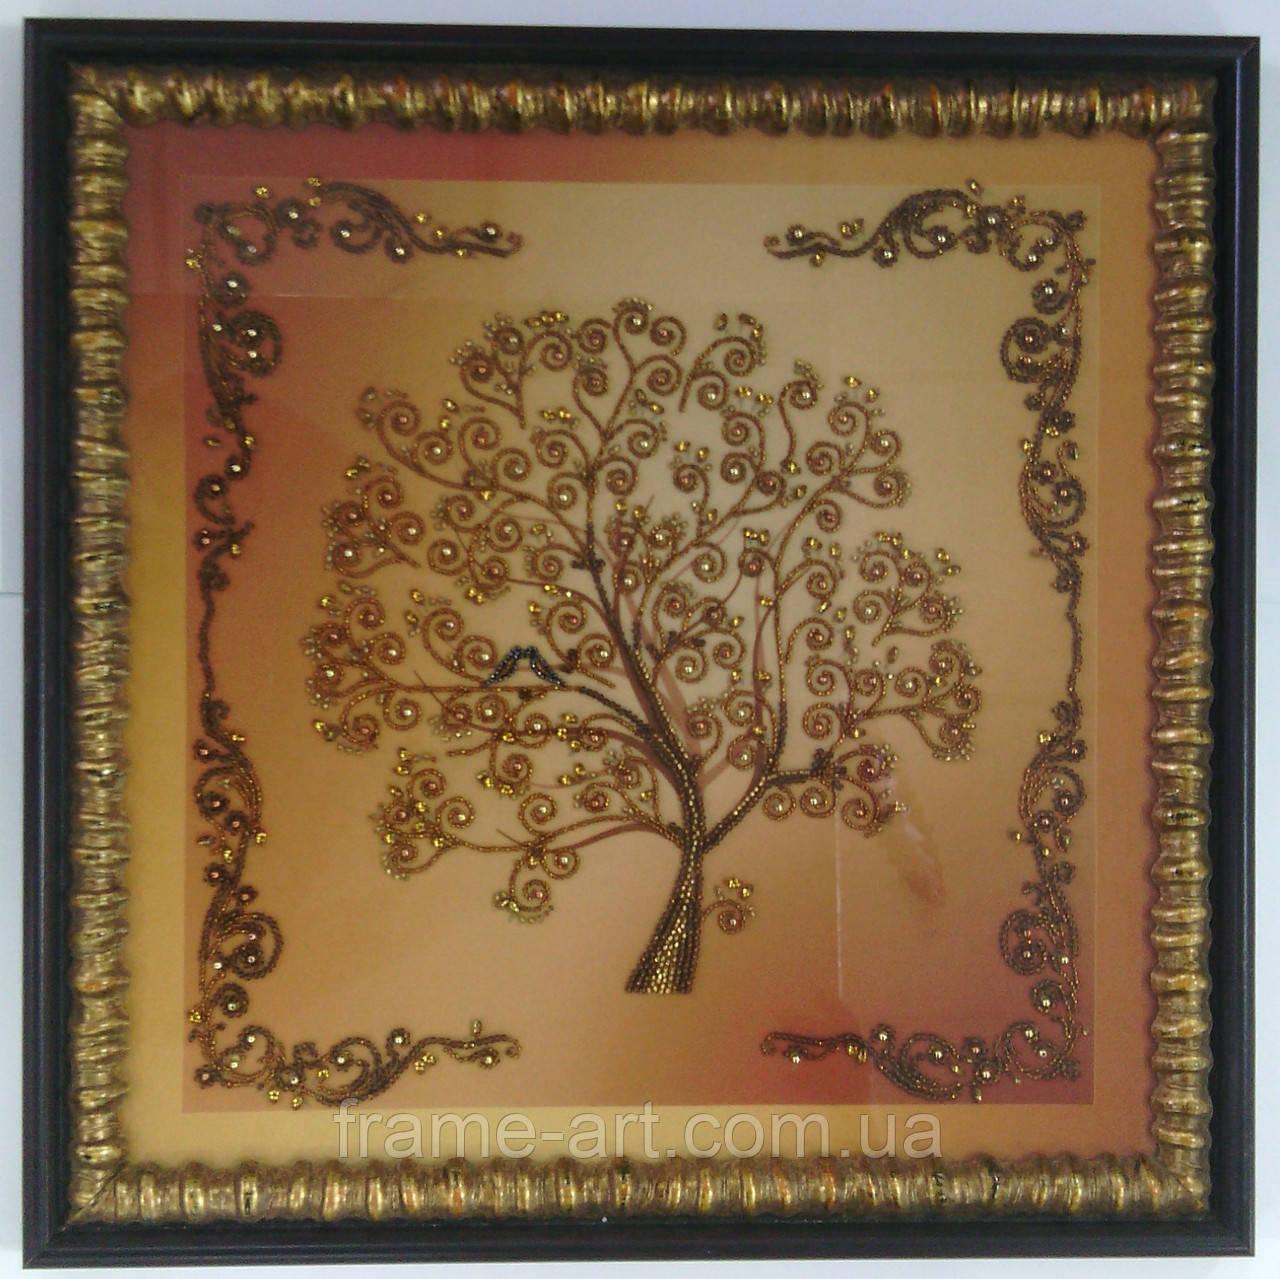 Картина Дерево изобилия 40*40см